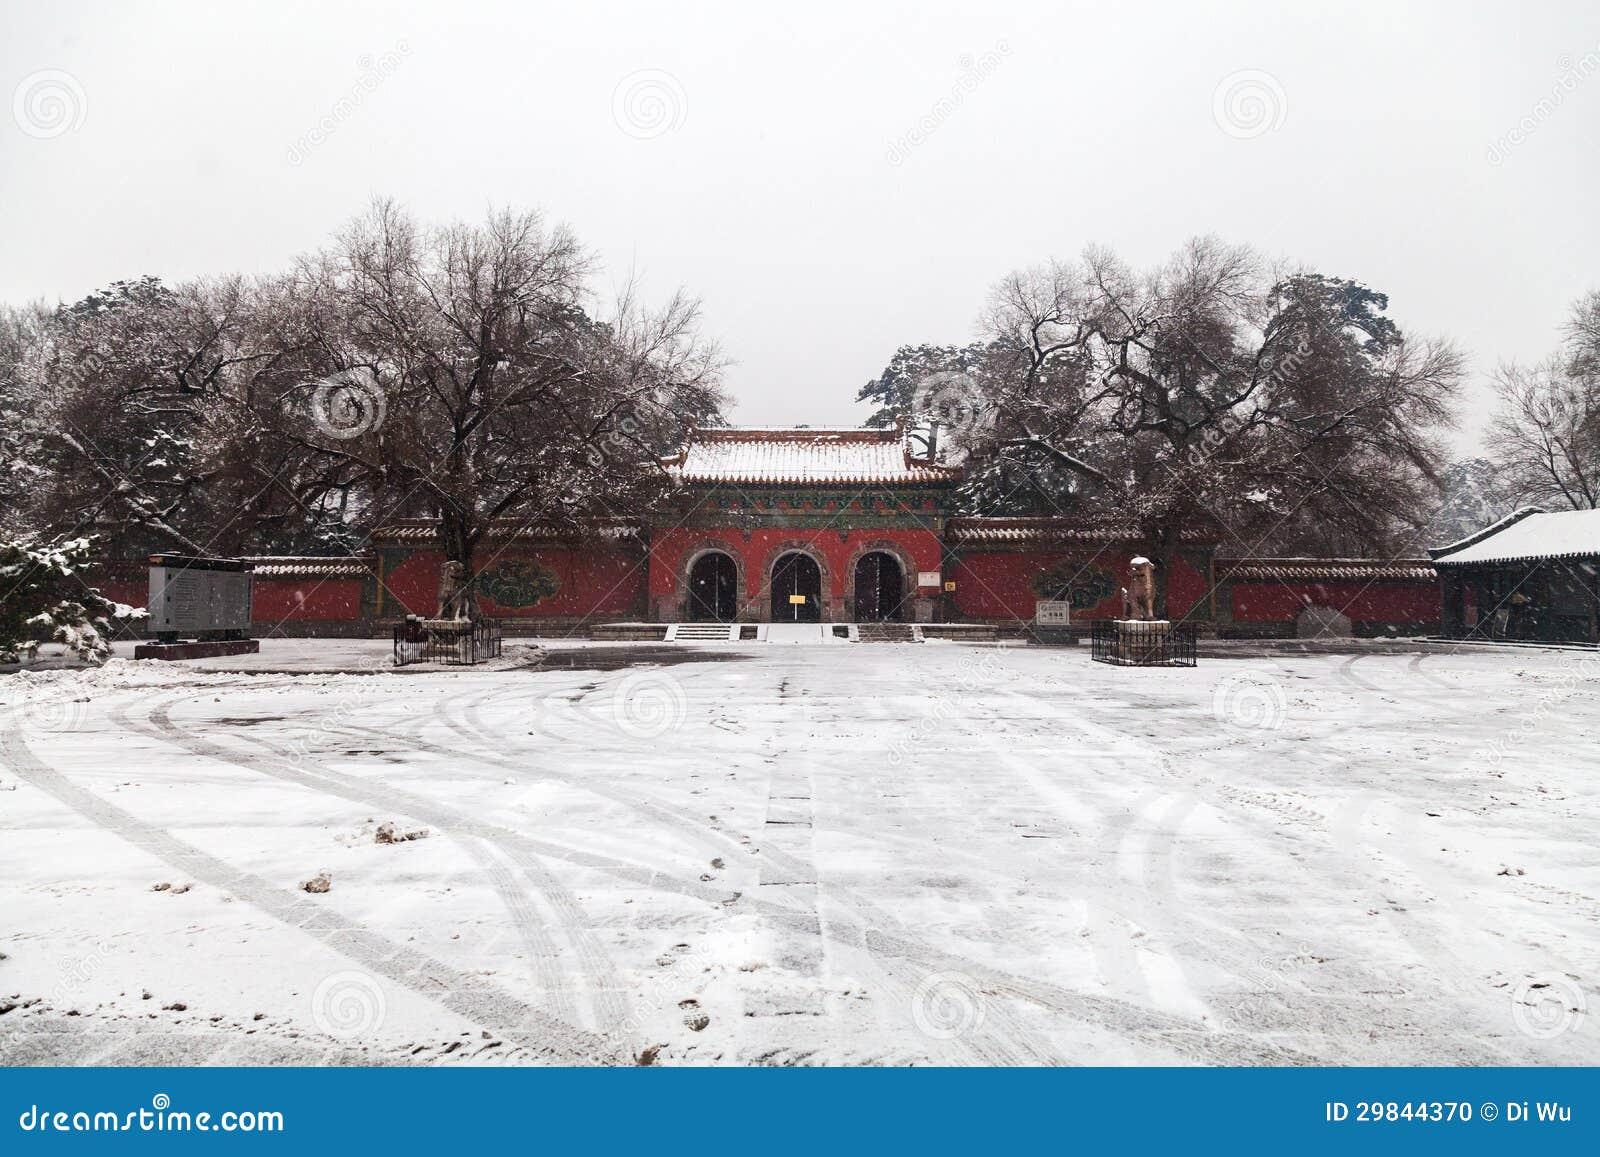 Arquitetura chinesa antiga no inverno